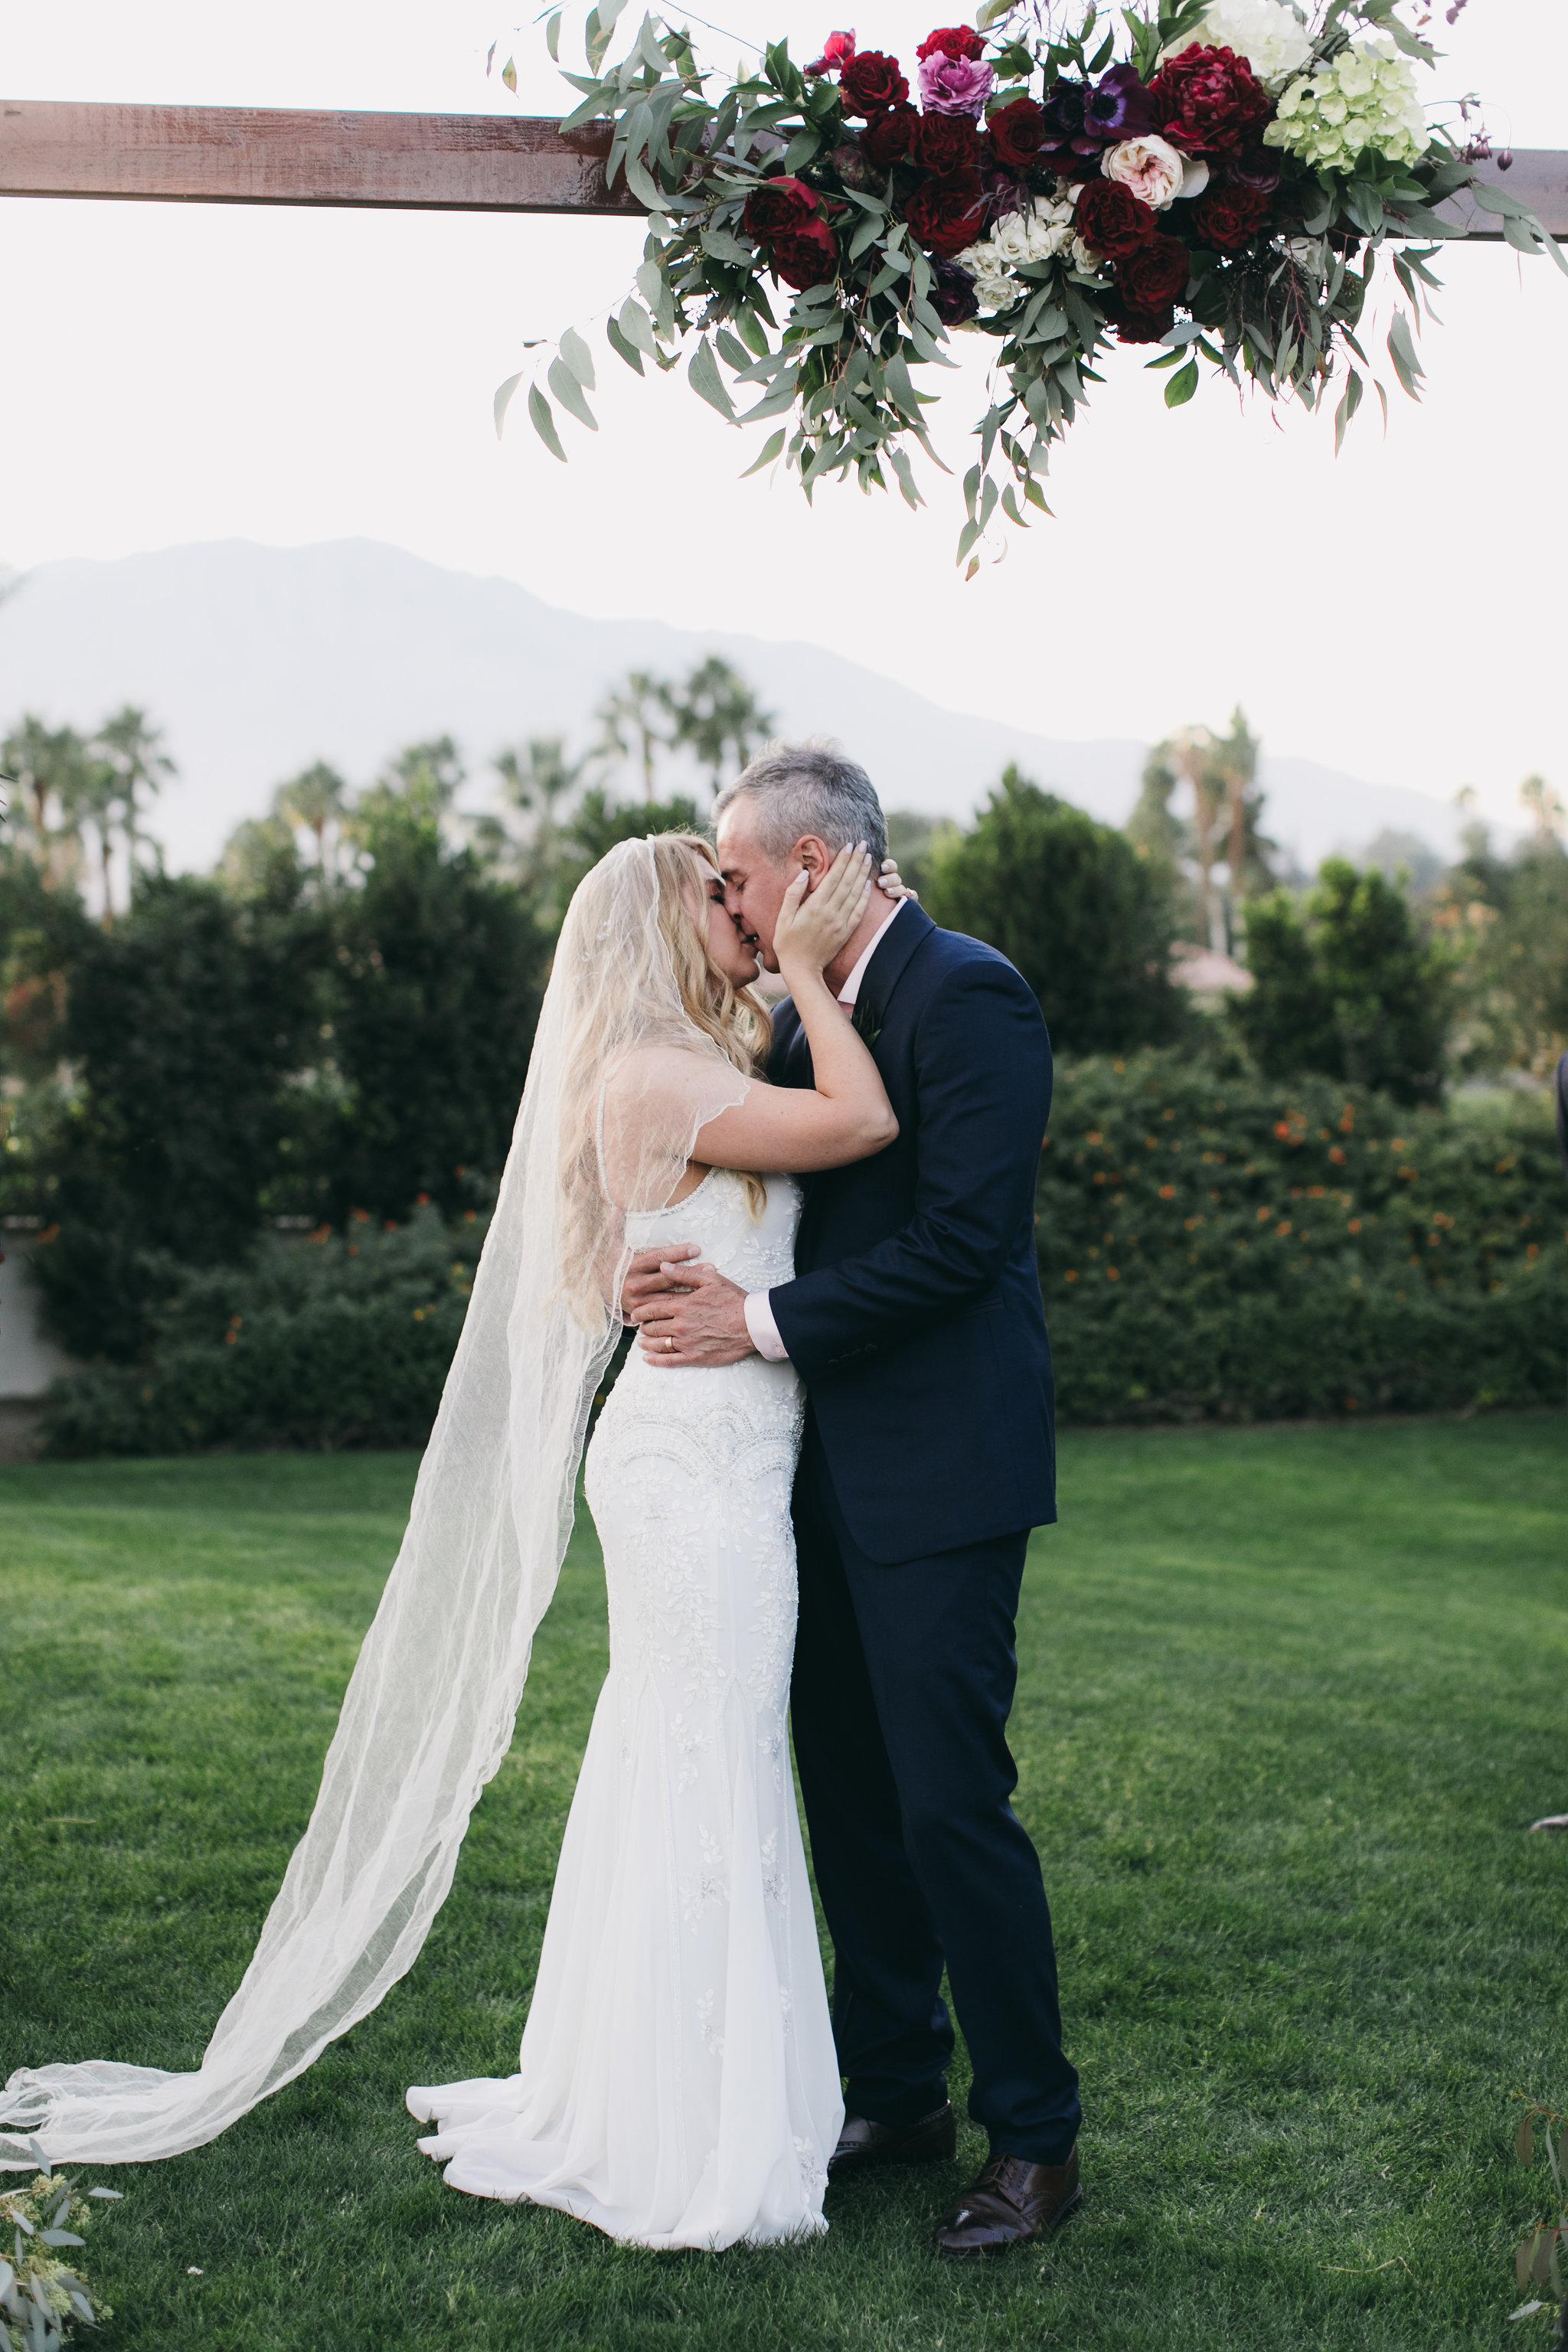 Gracy-Andrew-Wedding-511.jpg